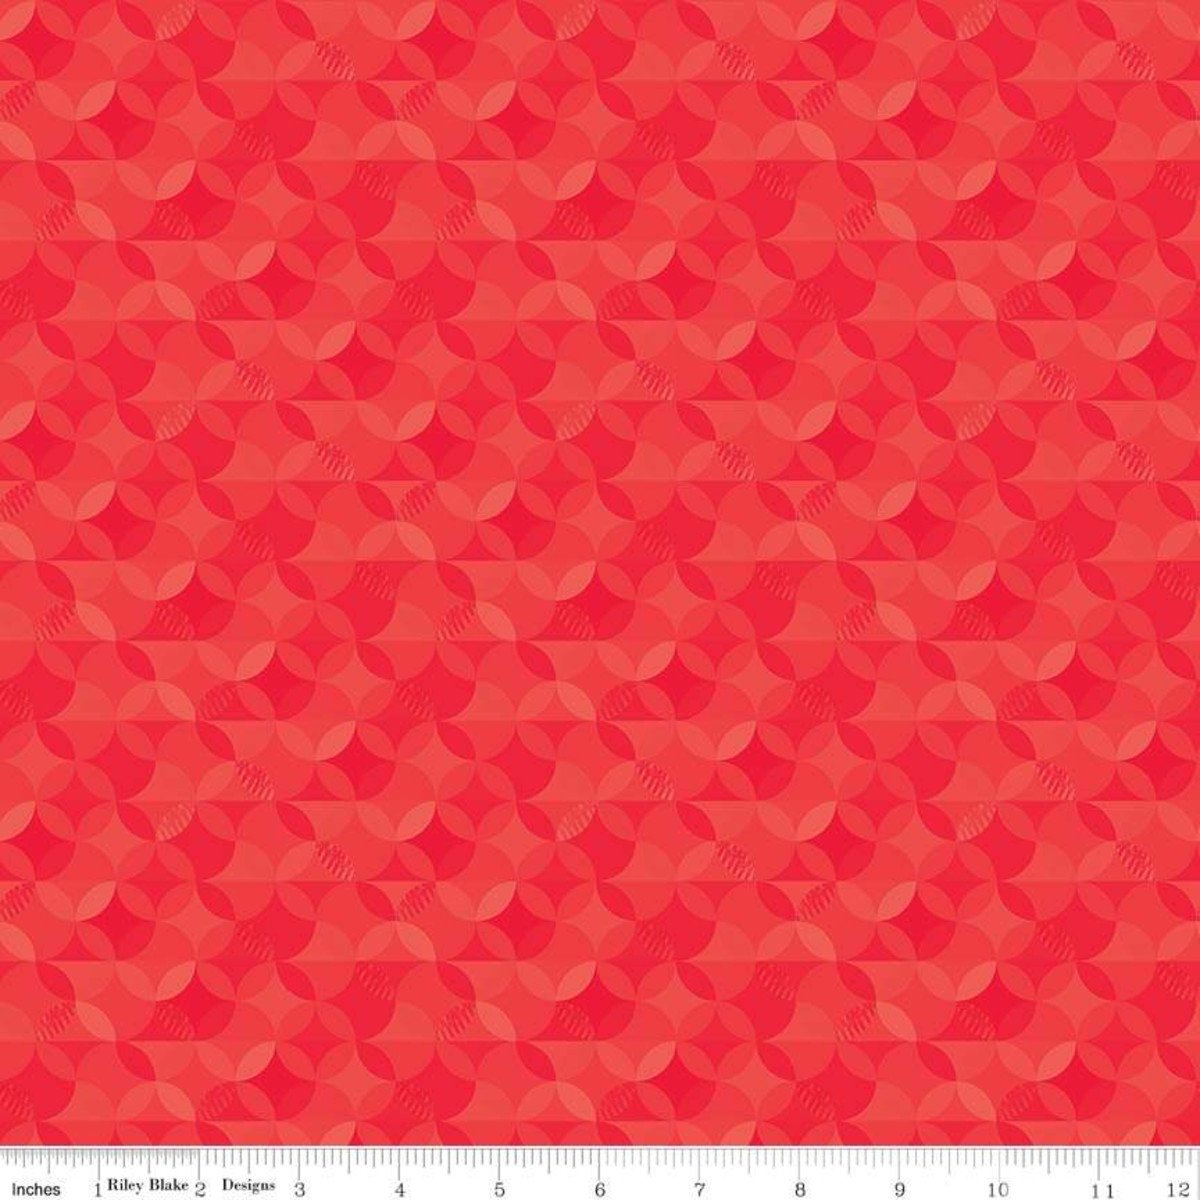 Riley Blake Crayola Kaleidoscope Scarlet - CR480-SCARLET